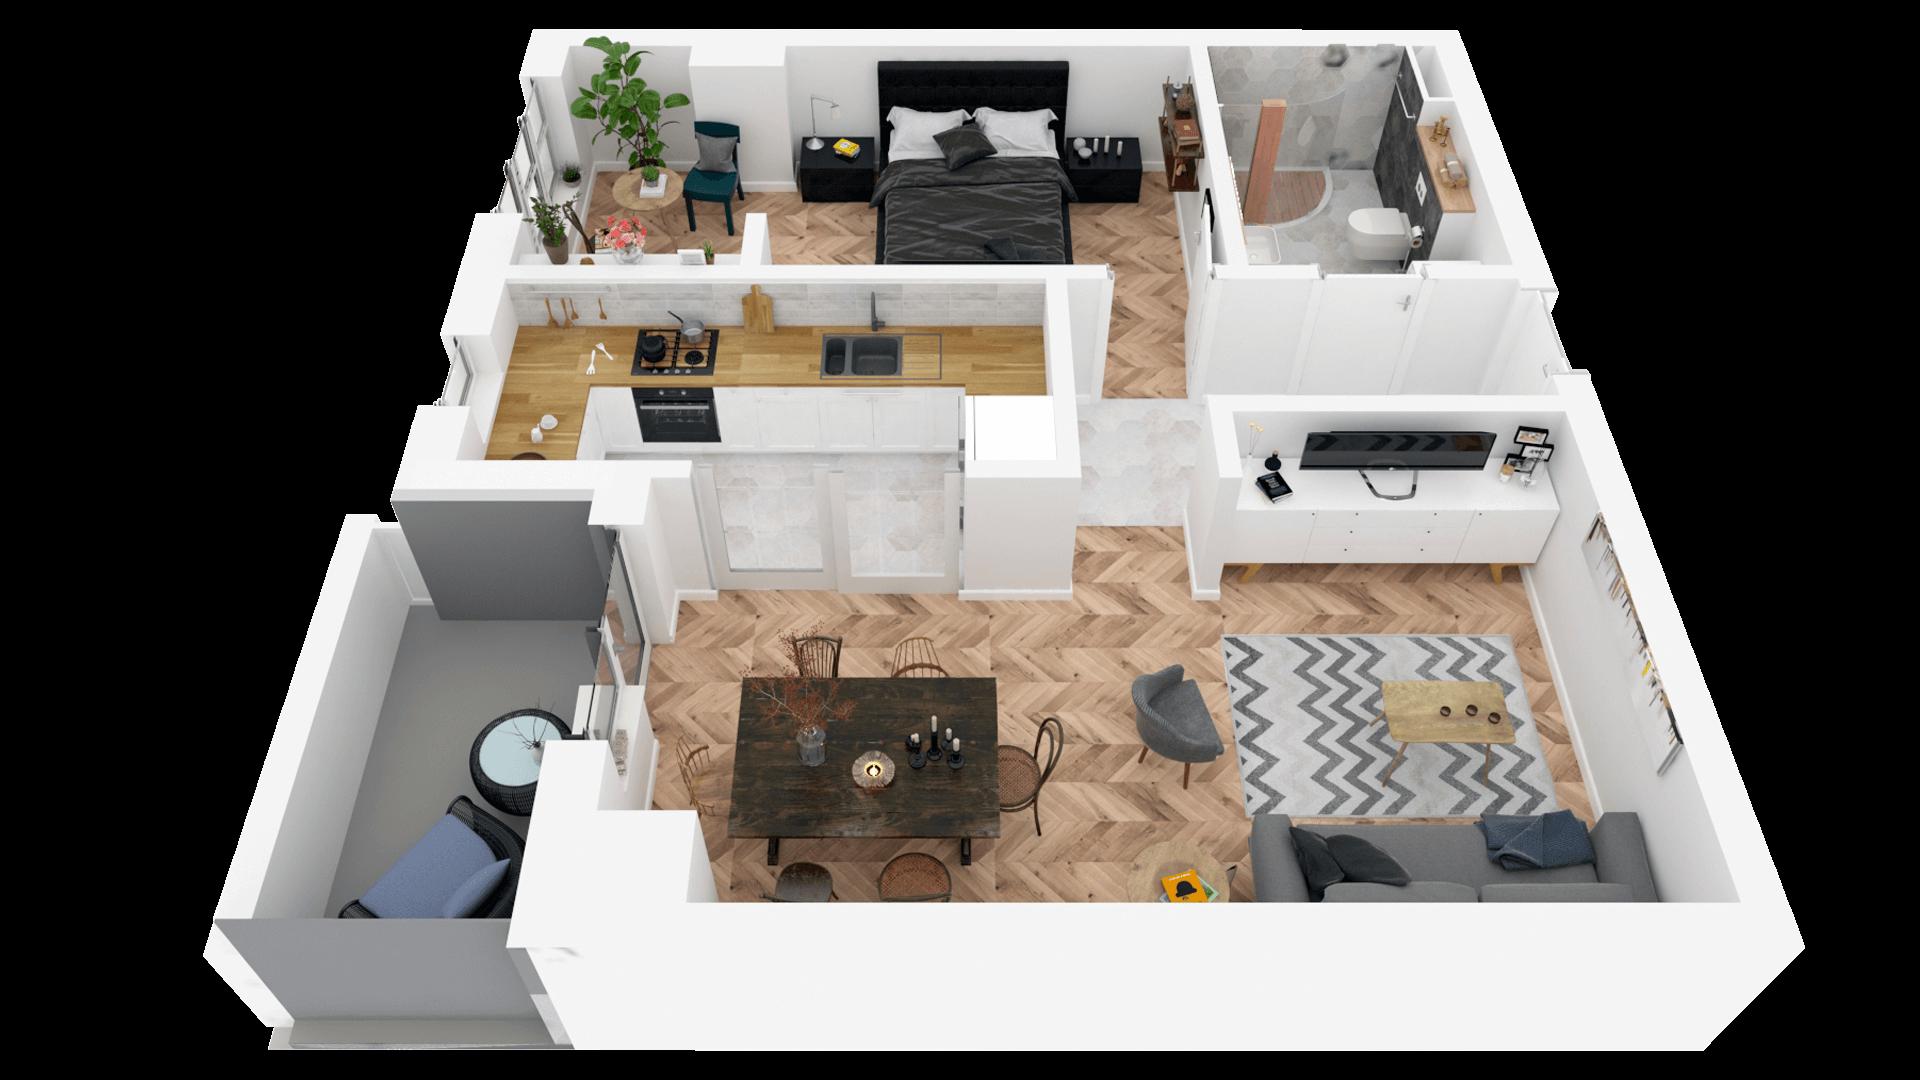 https://solumnia.ro/wp-content/uploads/2019/02/Solumnia_apartamente_noi_iasi_rate_la_dezvoltator_apartament_2_camere_tip_2h-3-1.png